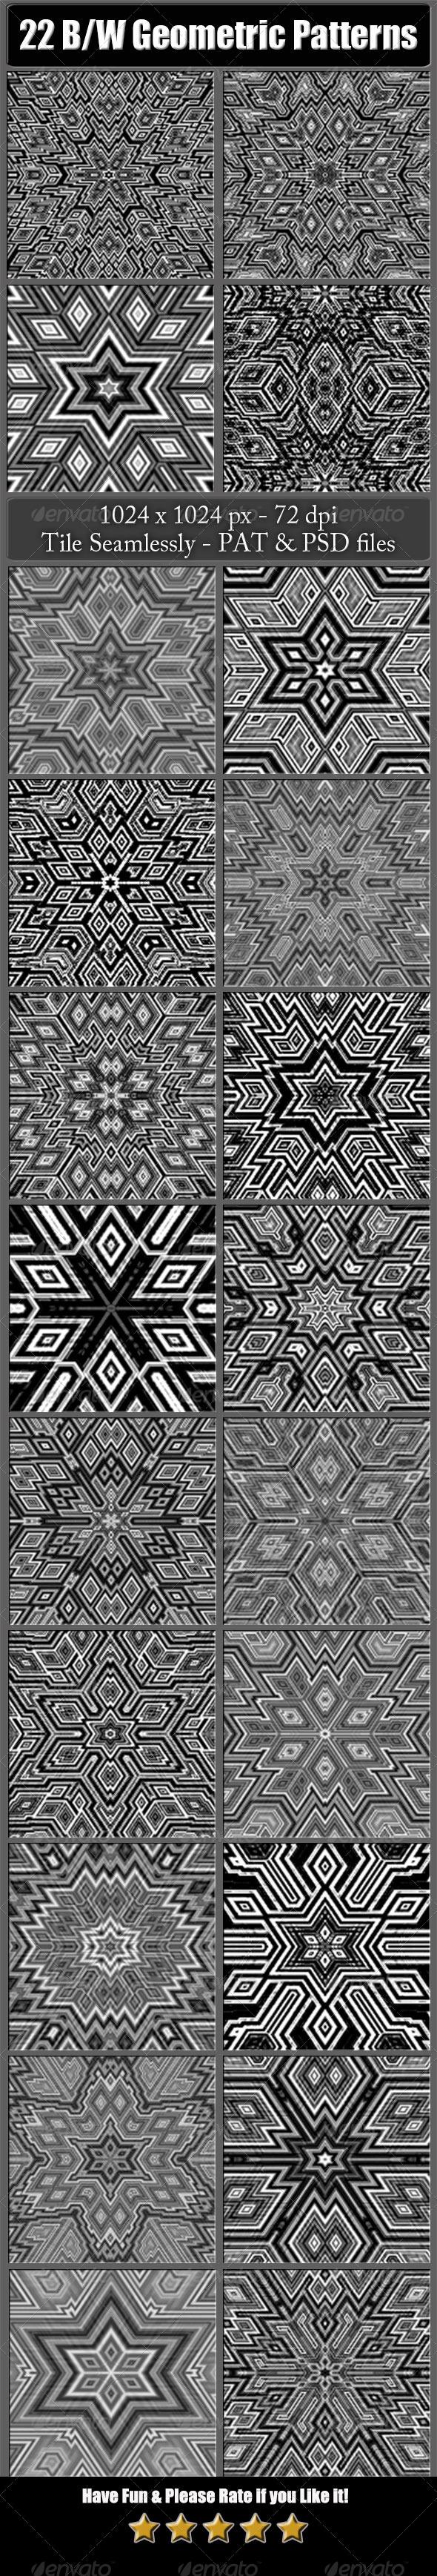 GraphicRiver 22 B&W Geometric Patterns 6492733